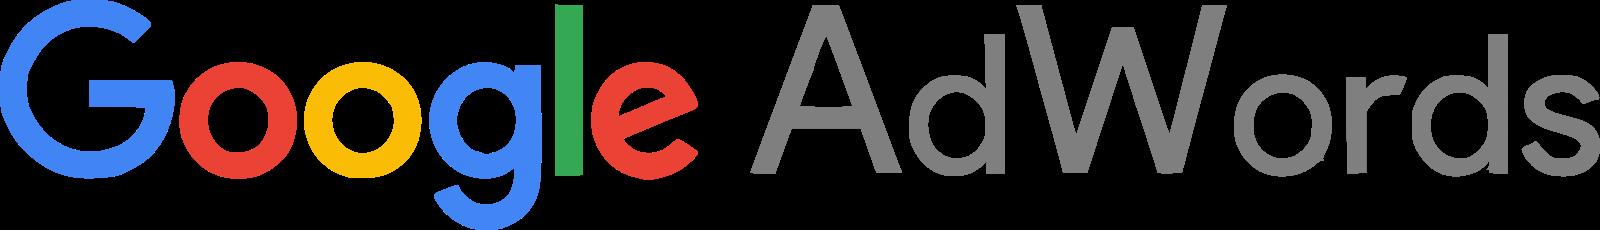 google adwords logo 4 - Google AdWords Logo